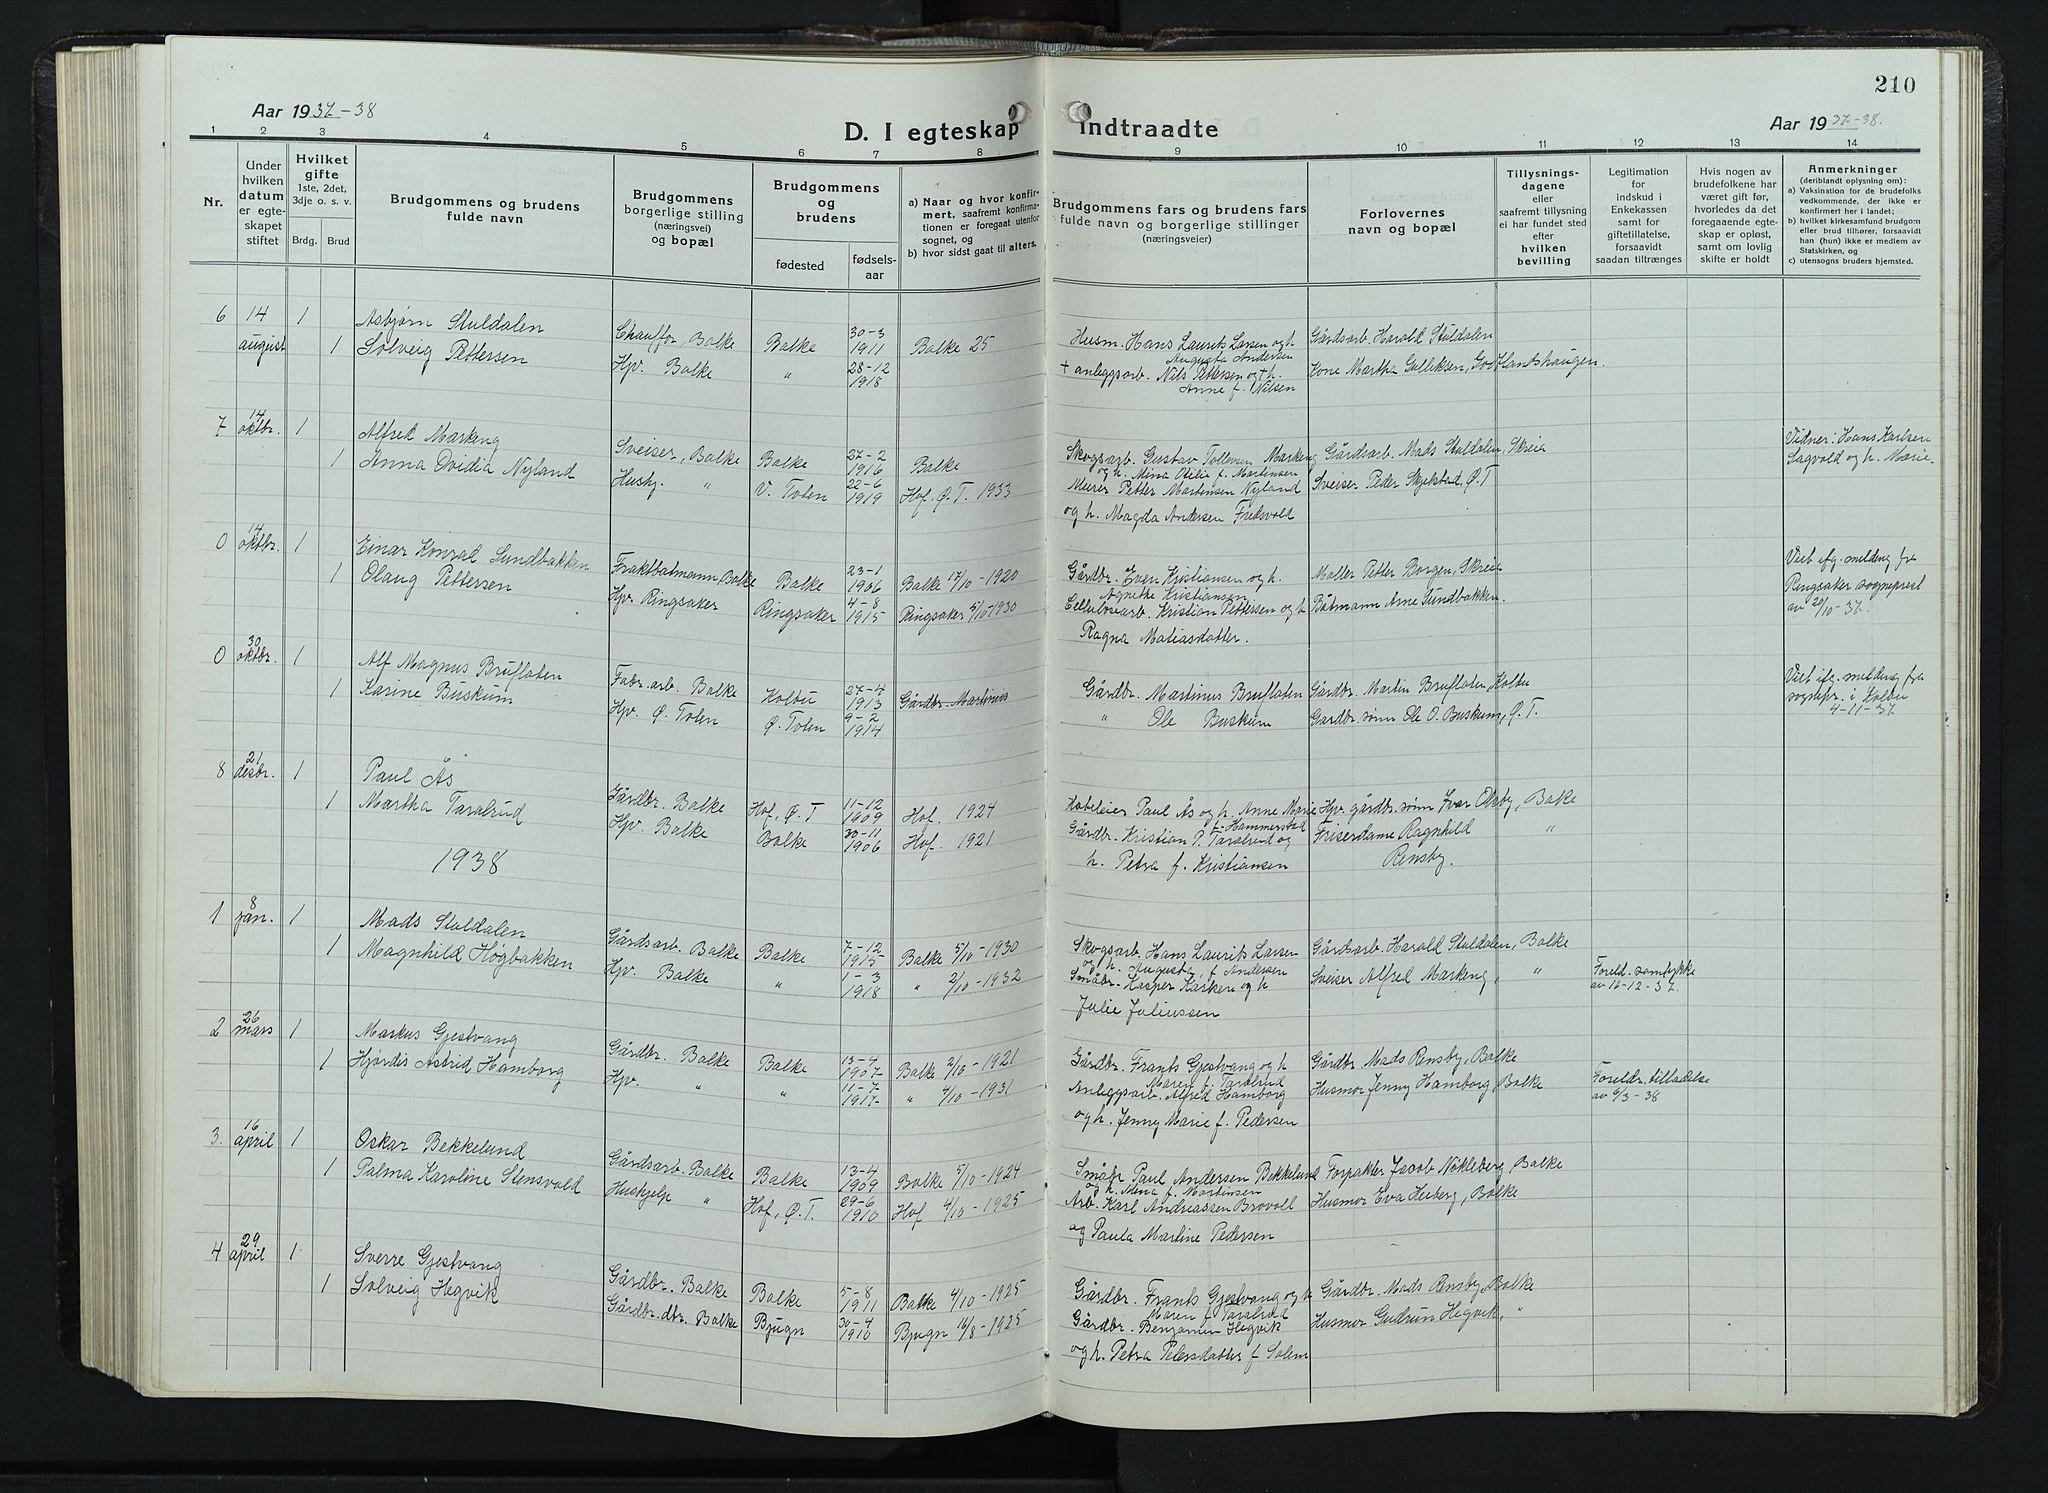 SAH, Balke prestekontor, Klokkerbok nr. 1, 1920-1955, s. 210